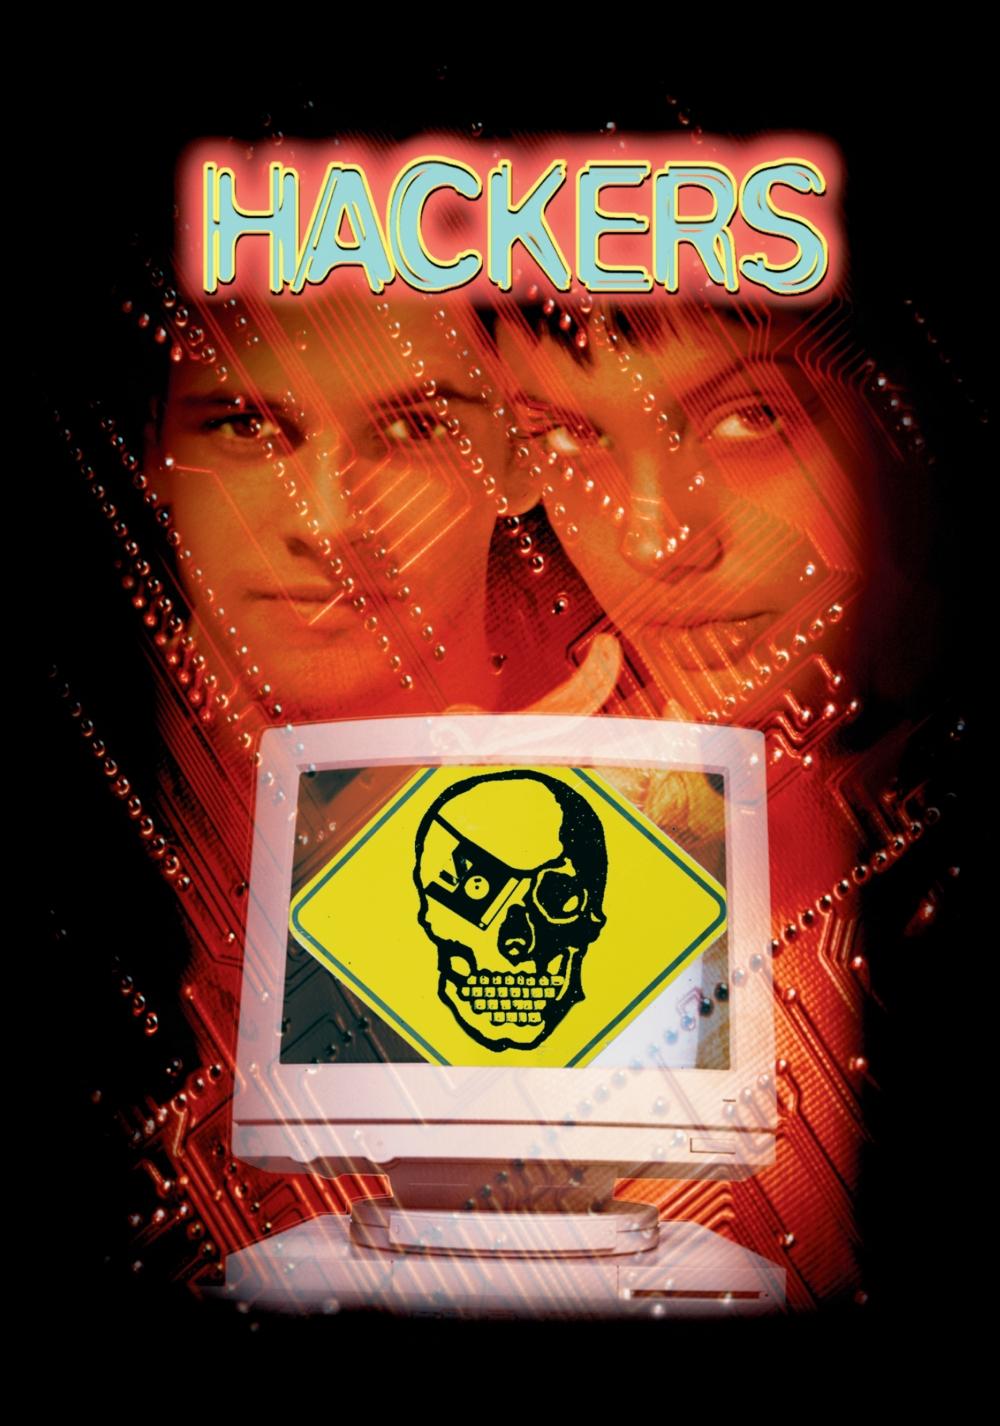 hackers-544bfb85ab9aa